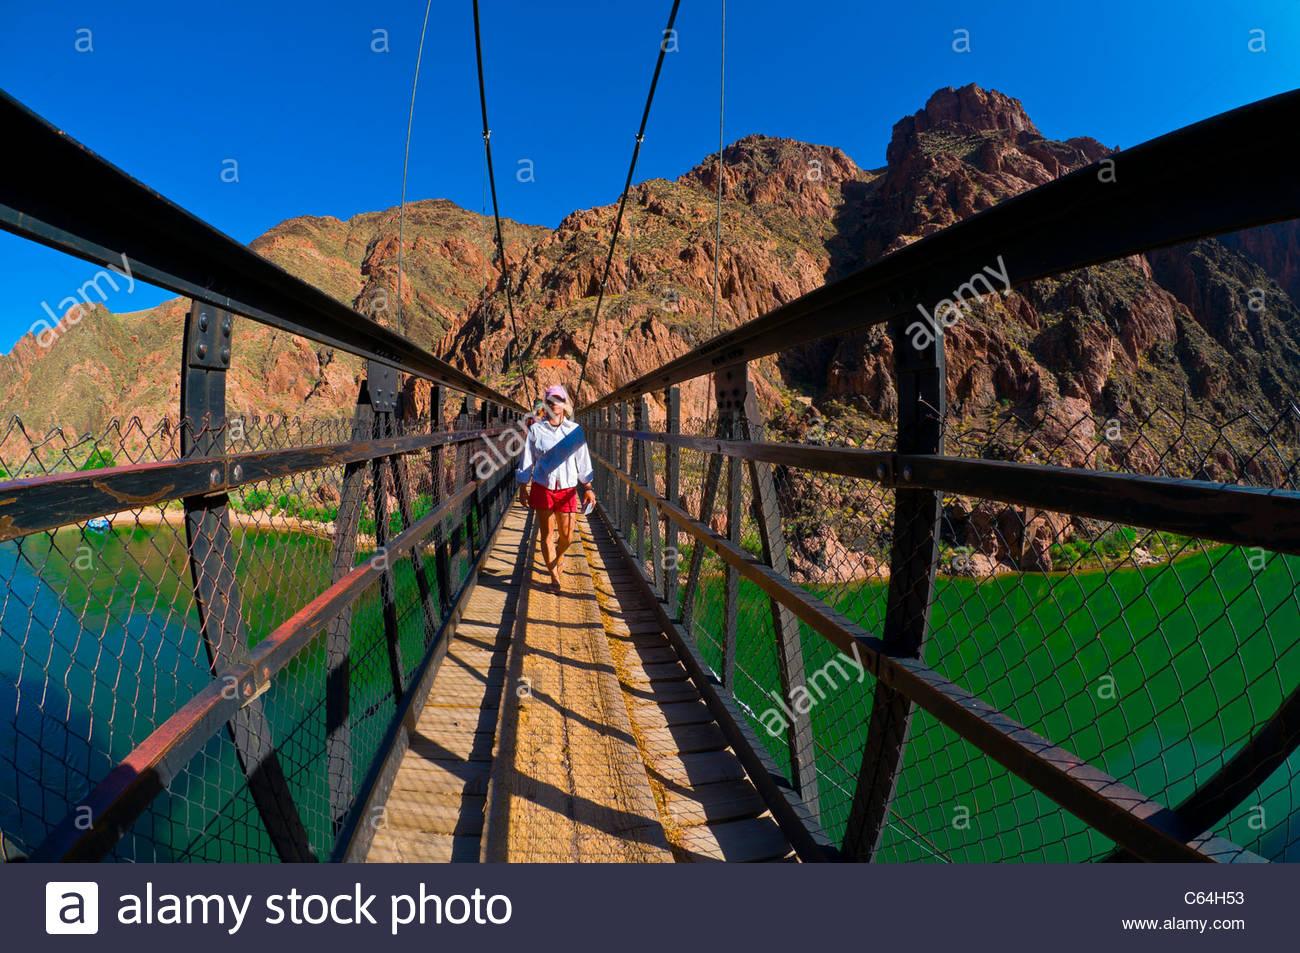 Kaibab Suspension Bridge, Whitewater rafting trip, Colorado RIver, Grand Canyon National Park, Arizona USA - Stock Image